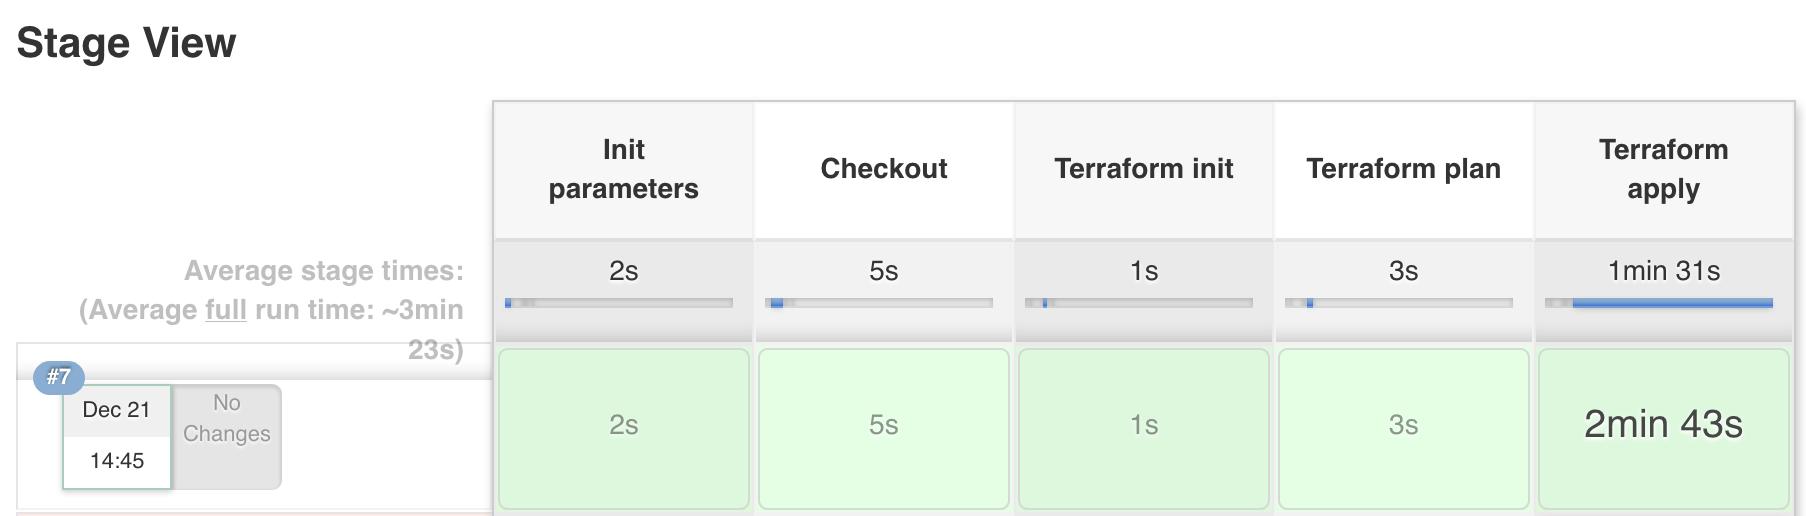 GitHub - Azure/terraform-with-jenkins-samples: Terraform plans